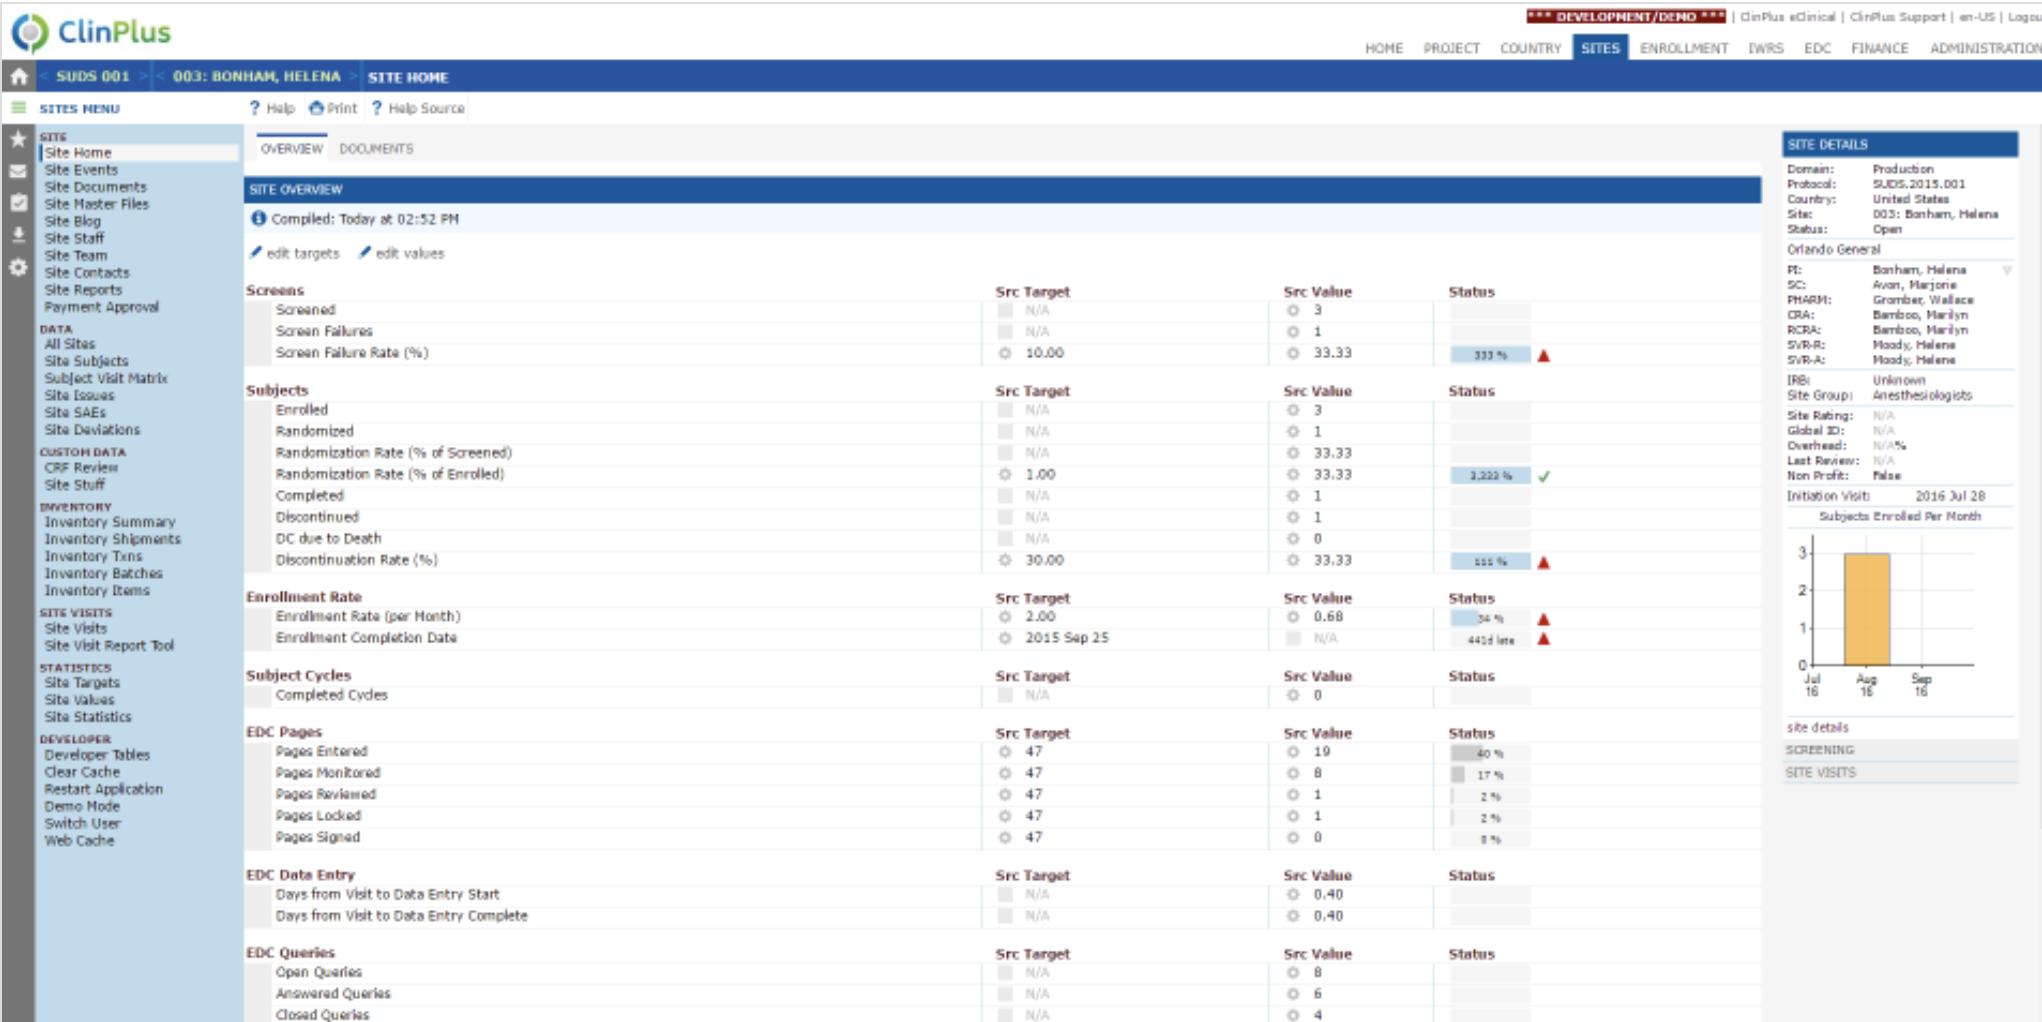 ClinPlus CTMS site overview